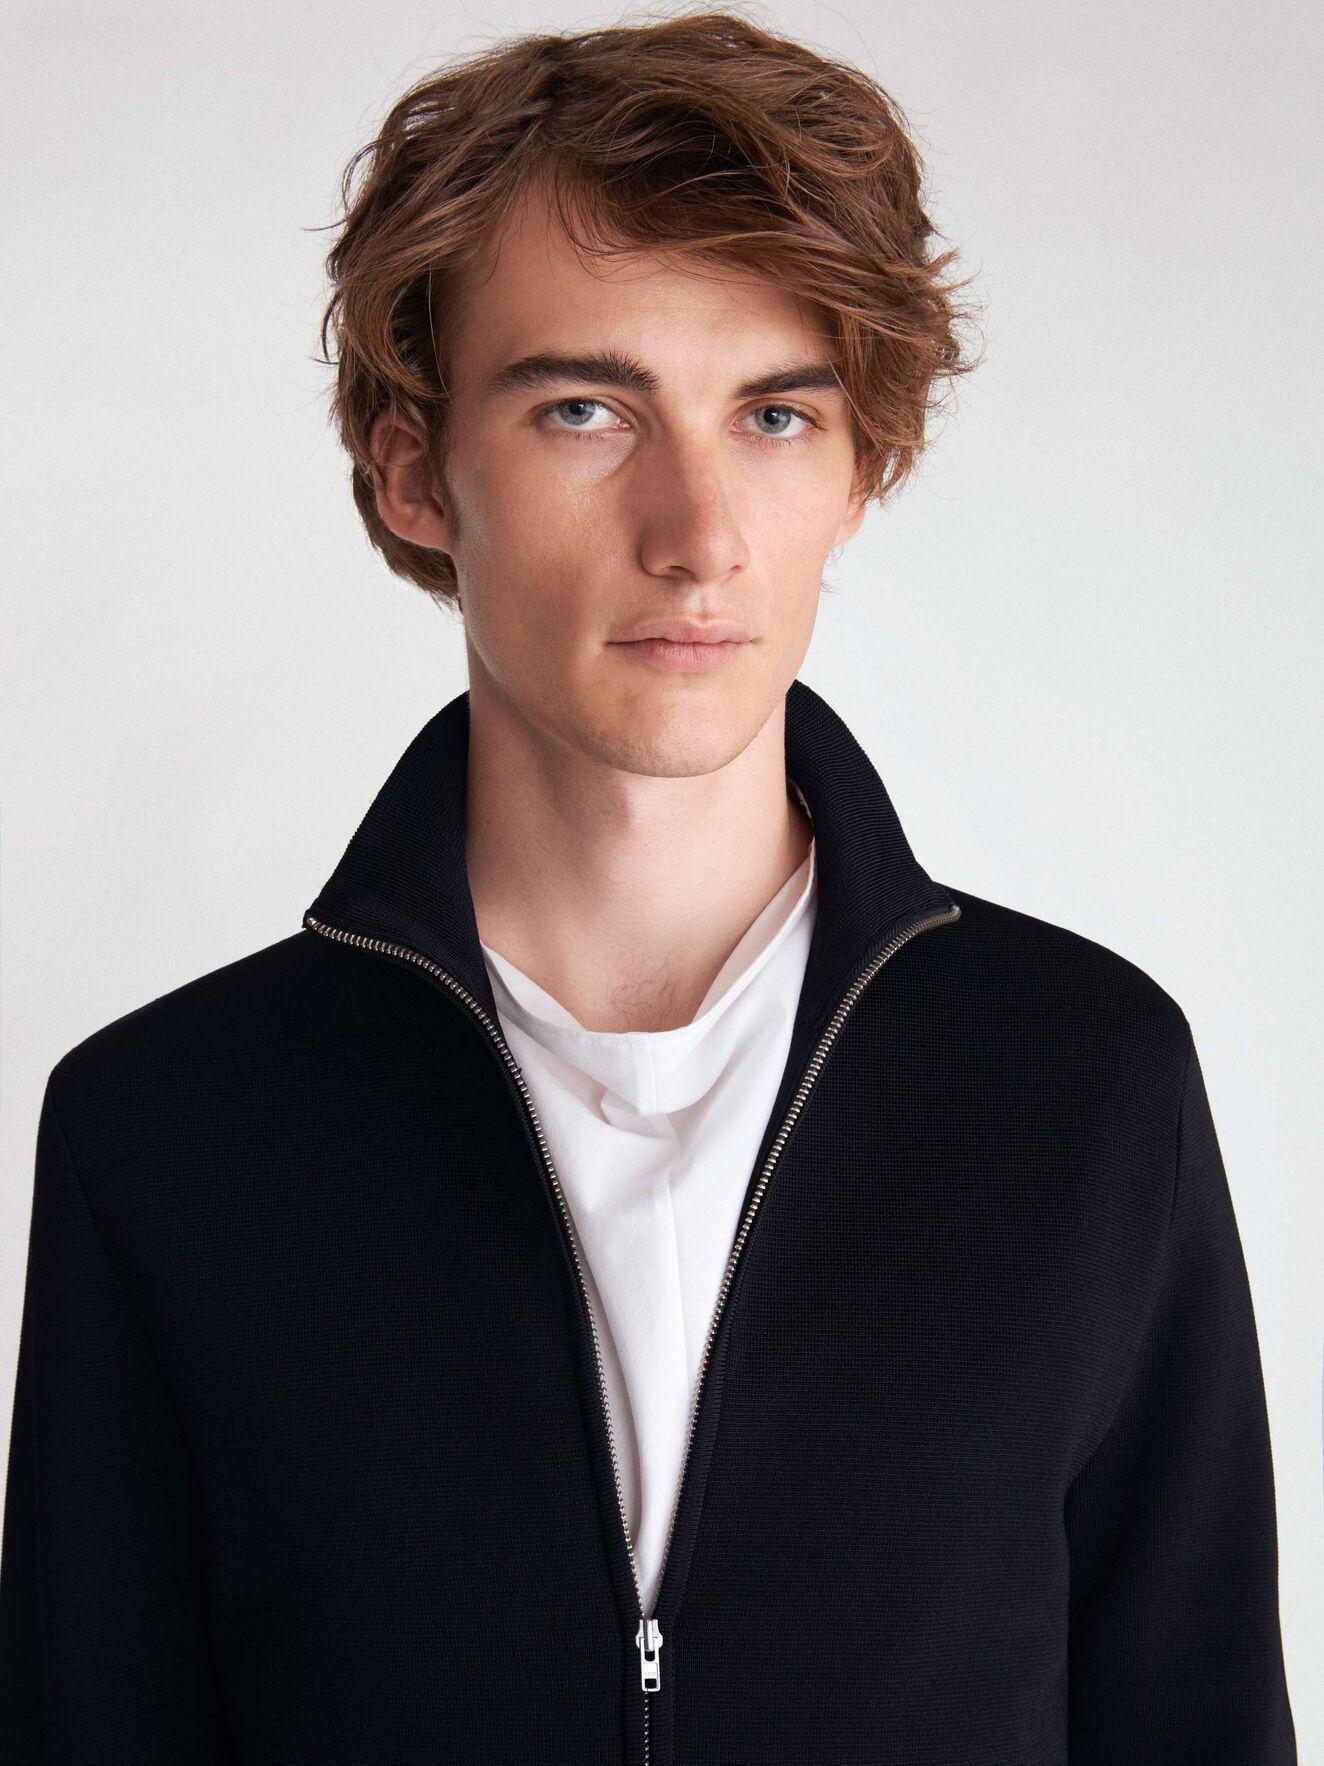 Norwyn Cardigan in Black from Tiger of Sweden